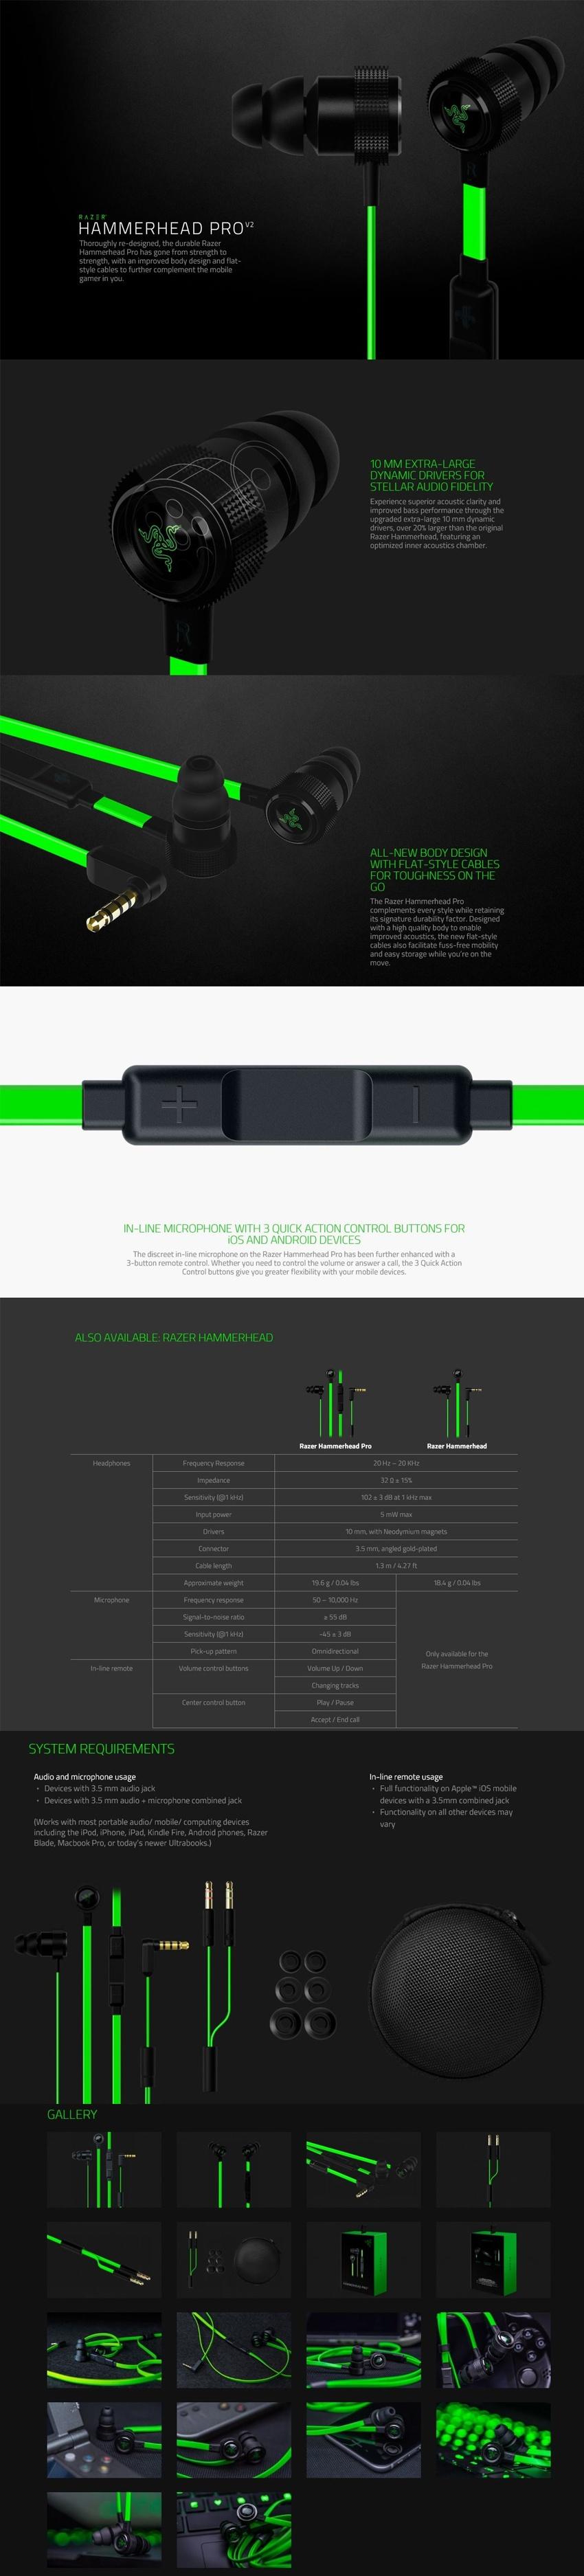 Razer Hammerhead Pro V2 Analog Gaming Music In Ear Headset Specifications Of